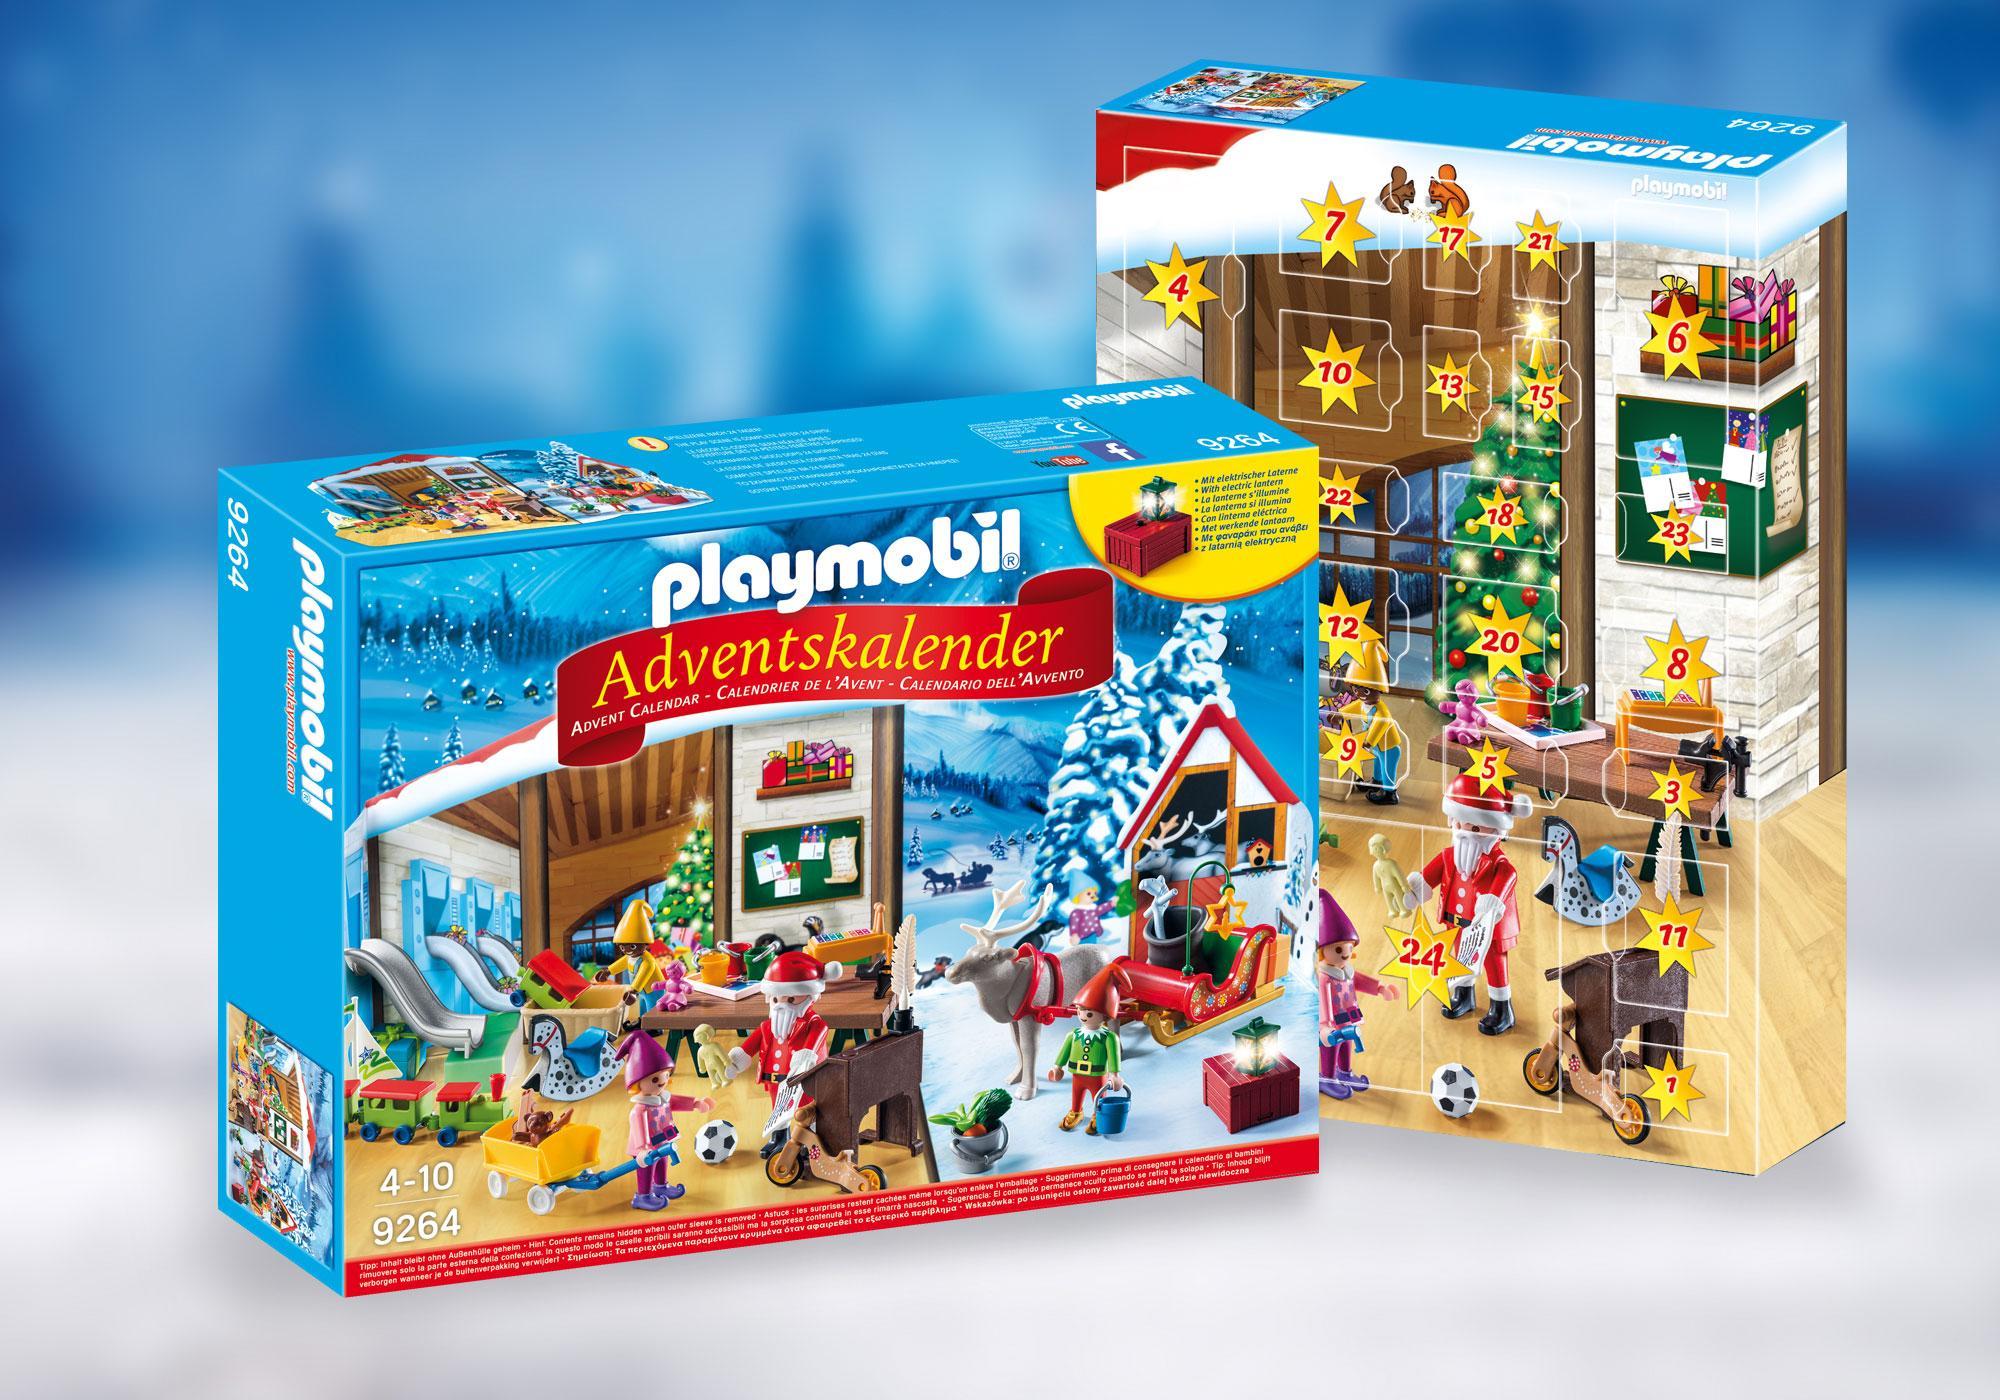 http://media.playmobil.com/i/playmobil/9264_product_detail